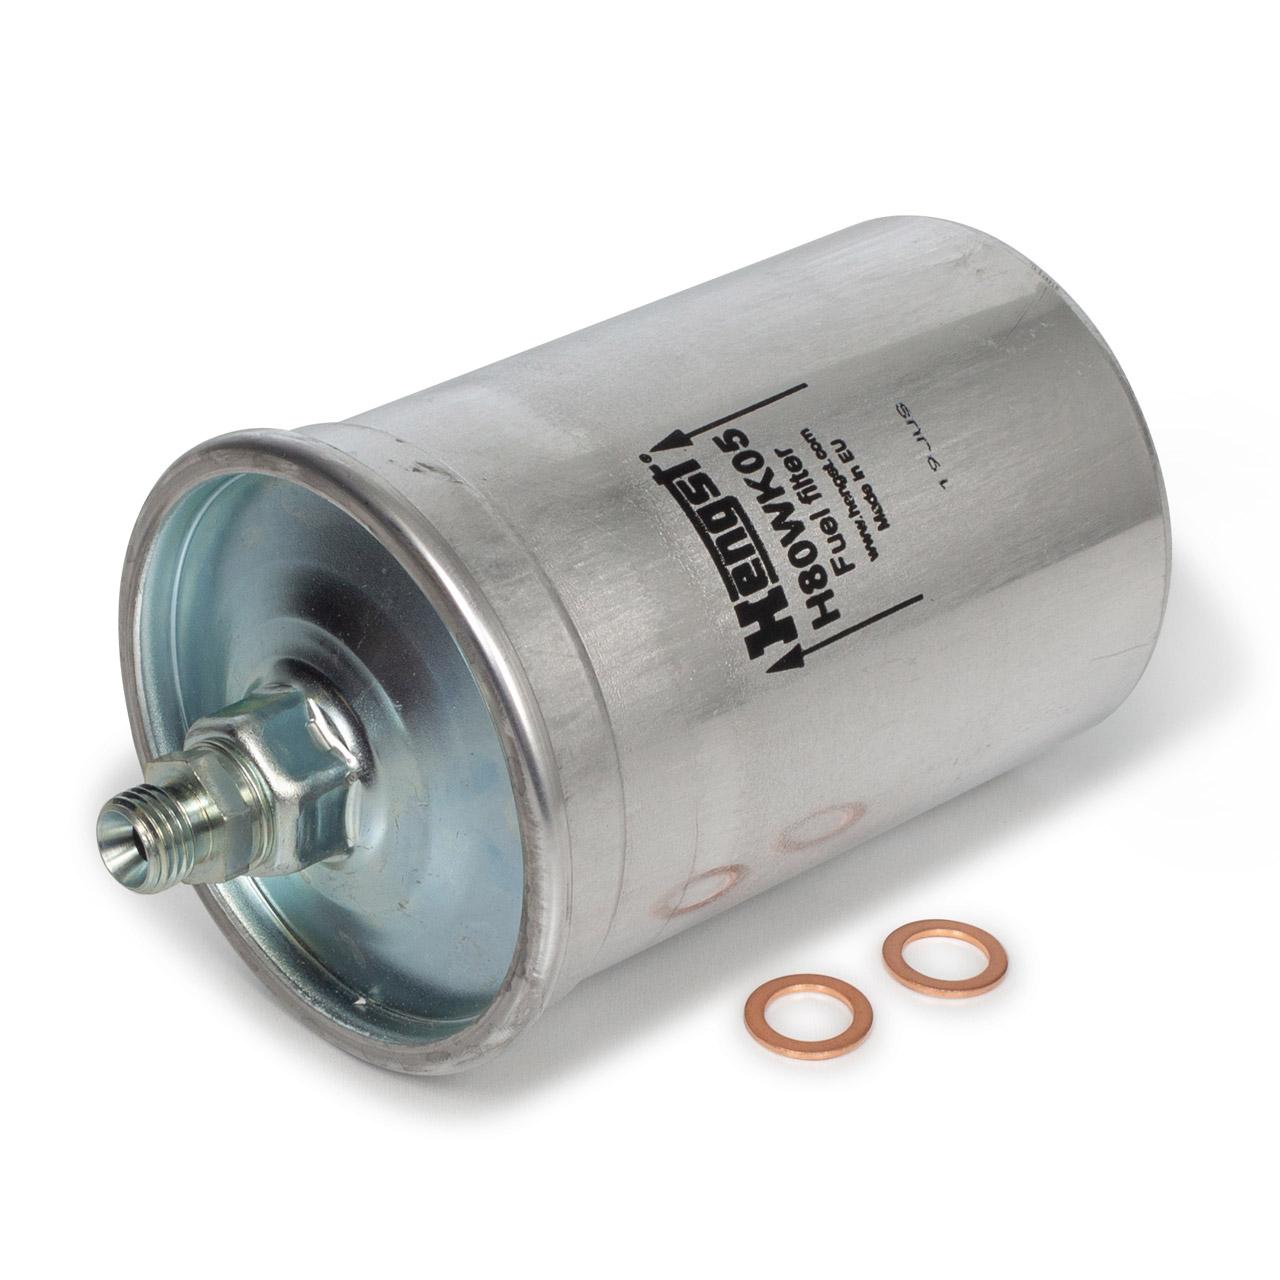 Inspektionskit Filterpaket Filterset für Mercedes SL R129 Cabriolet 300SL 190 PS